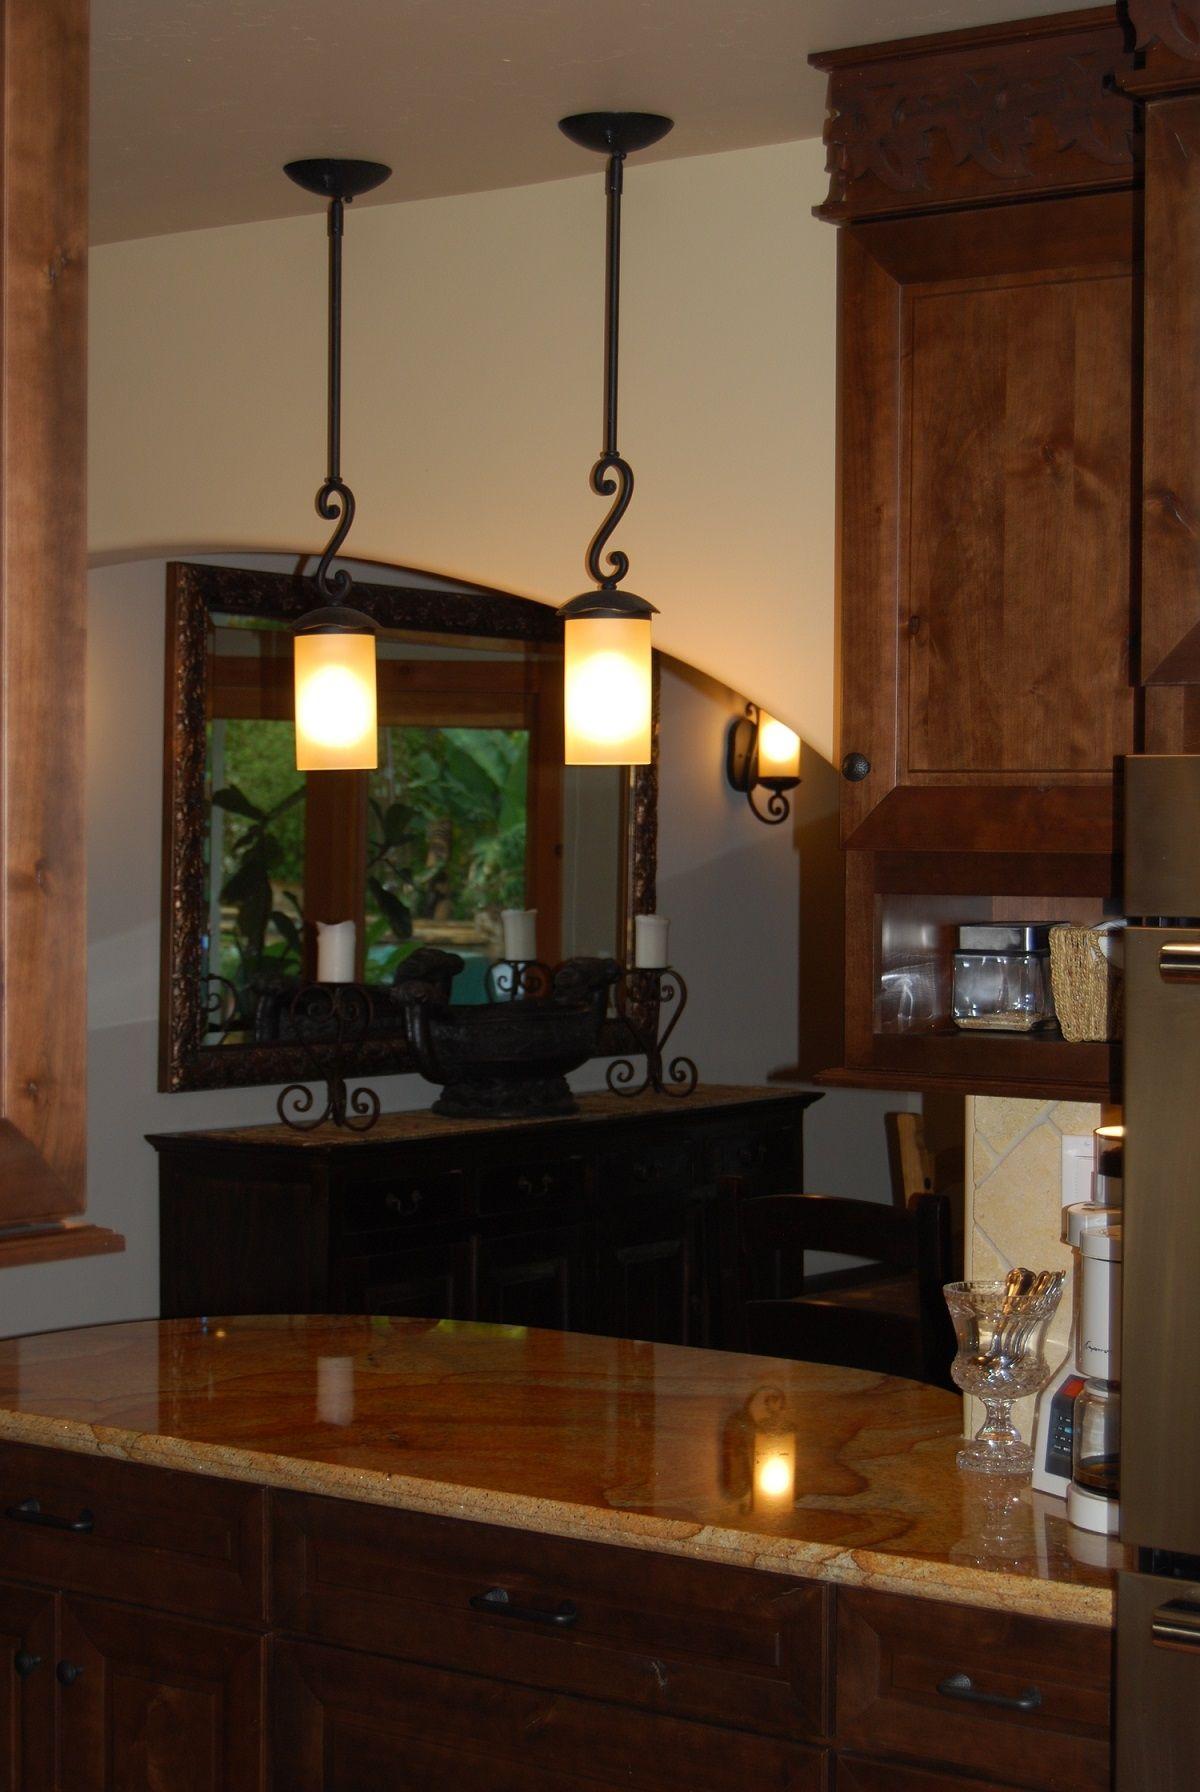 Wrought Iron Kitchen Pendant Lighting Wrought Iron Light